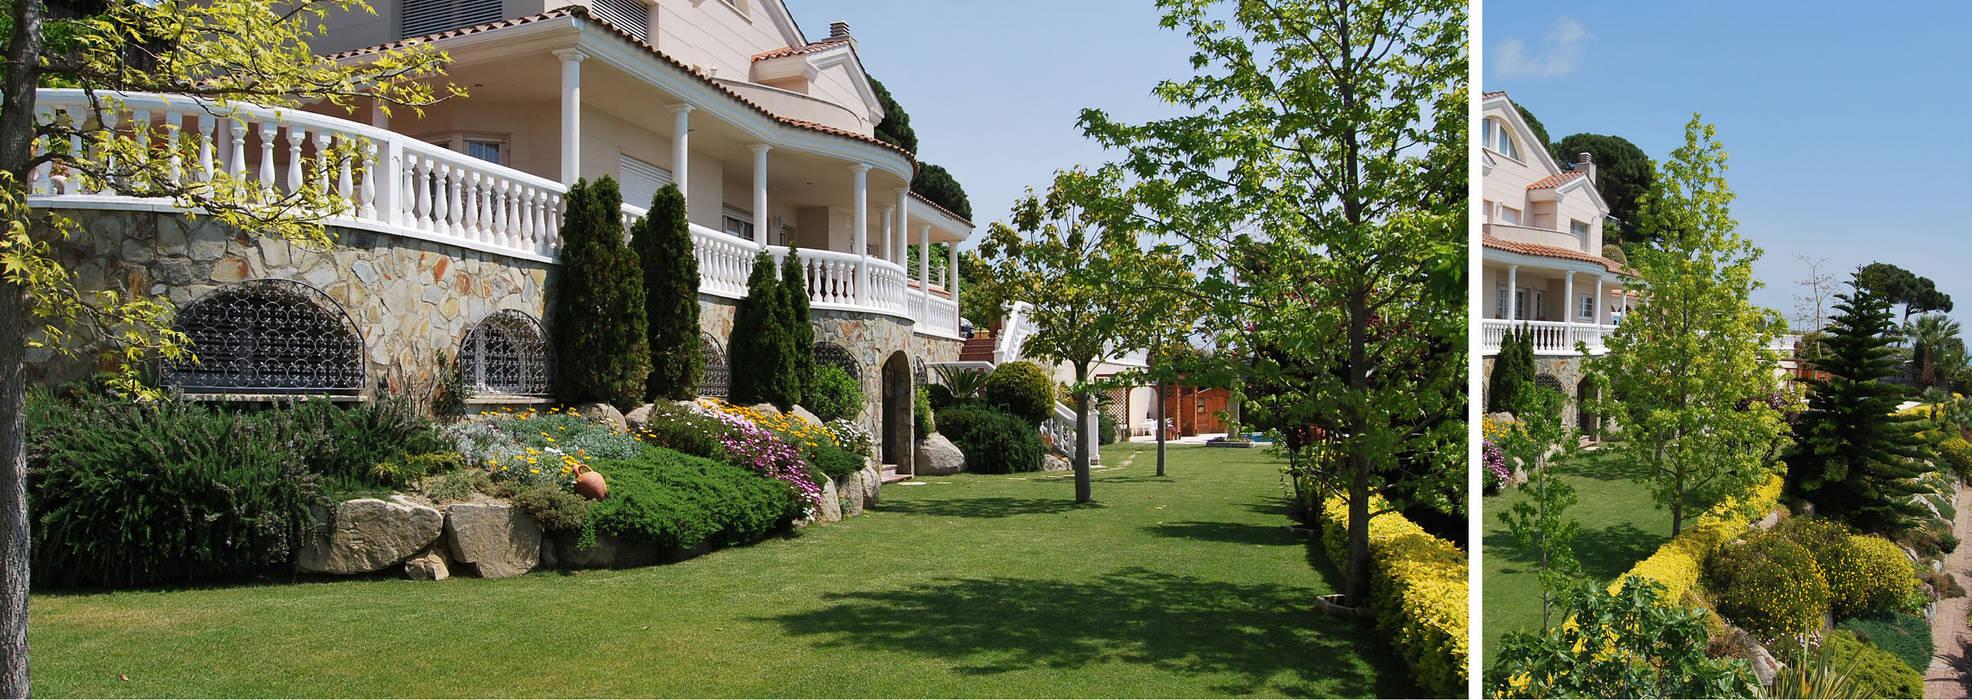 Mediterranean style houses by jjdelgado arquitectura Mediterranean